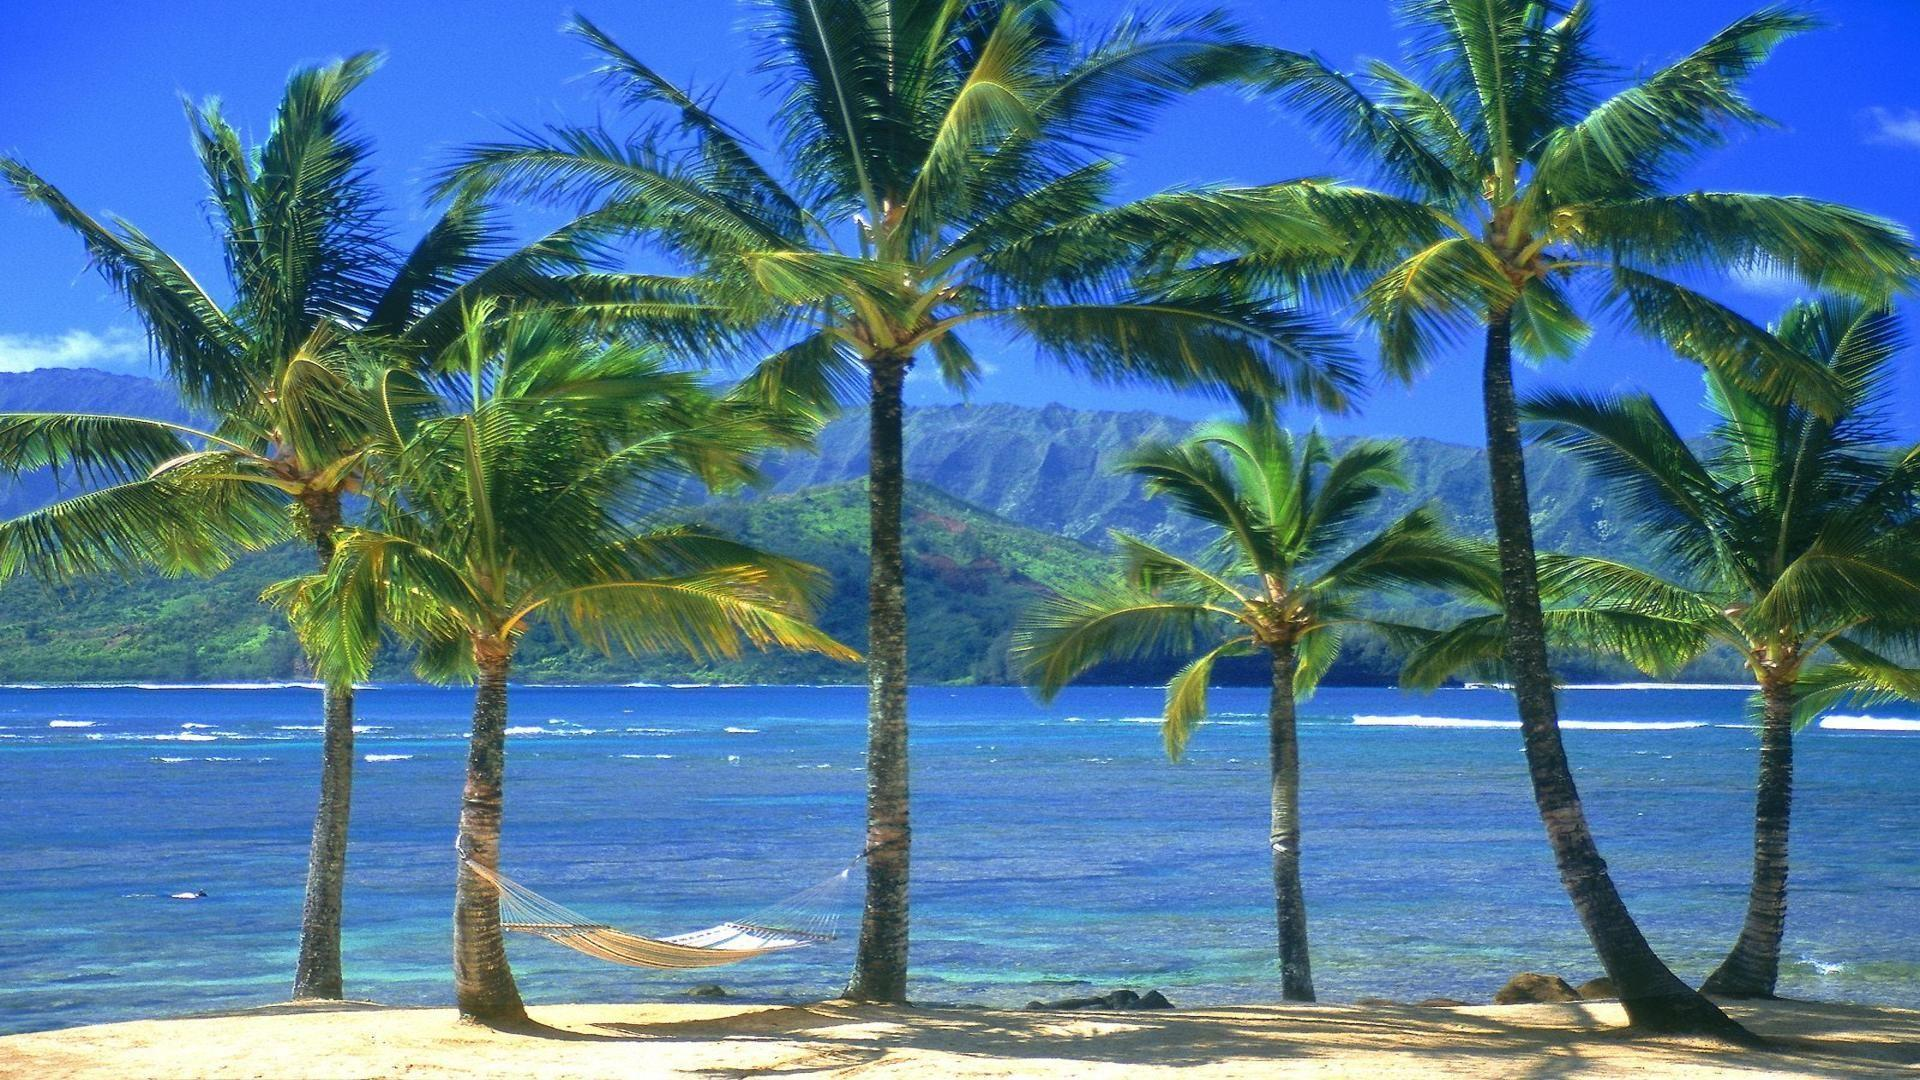 54+ Hawaiian Wallpaper Desktop on WallpaperSafari